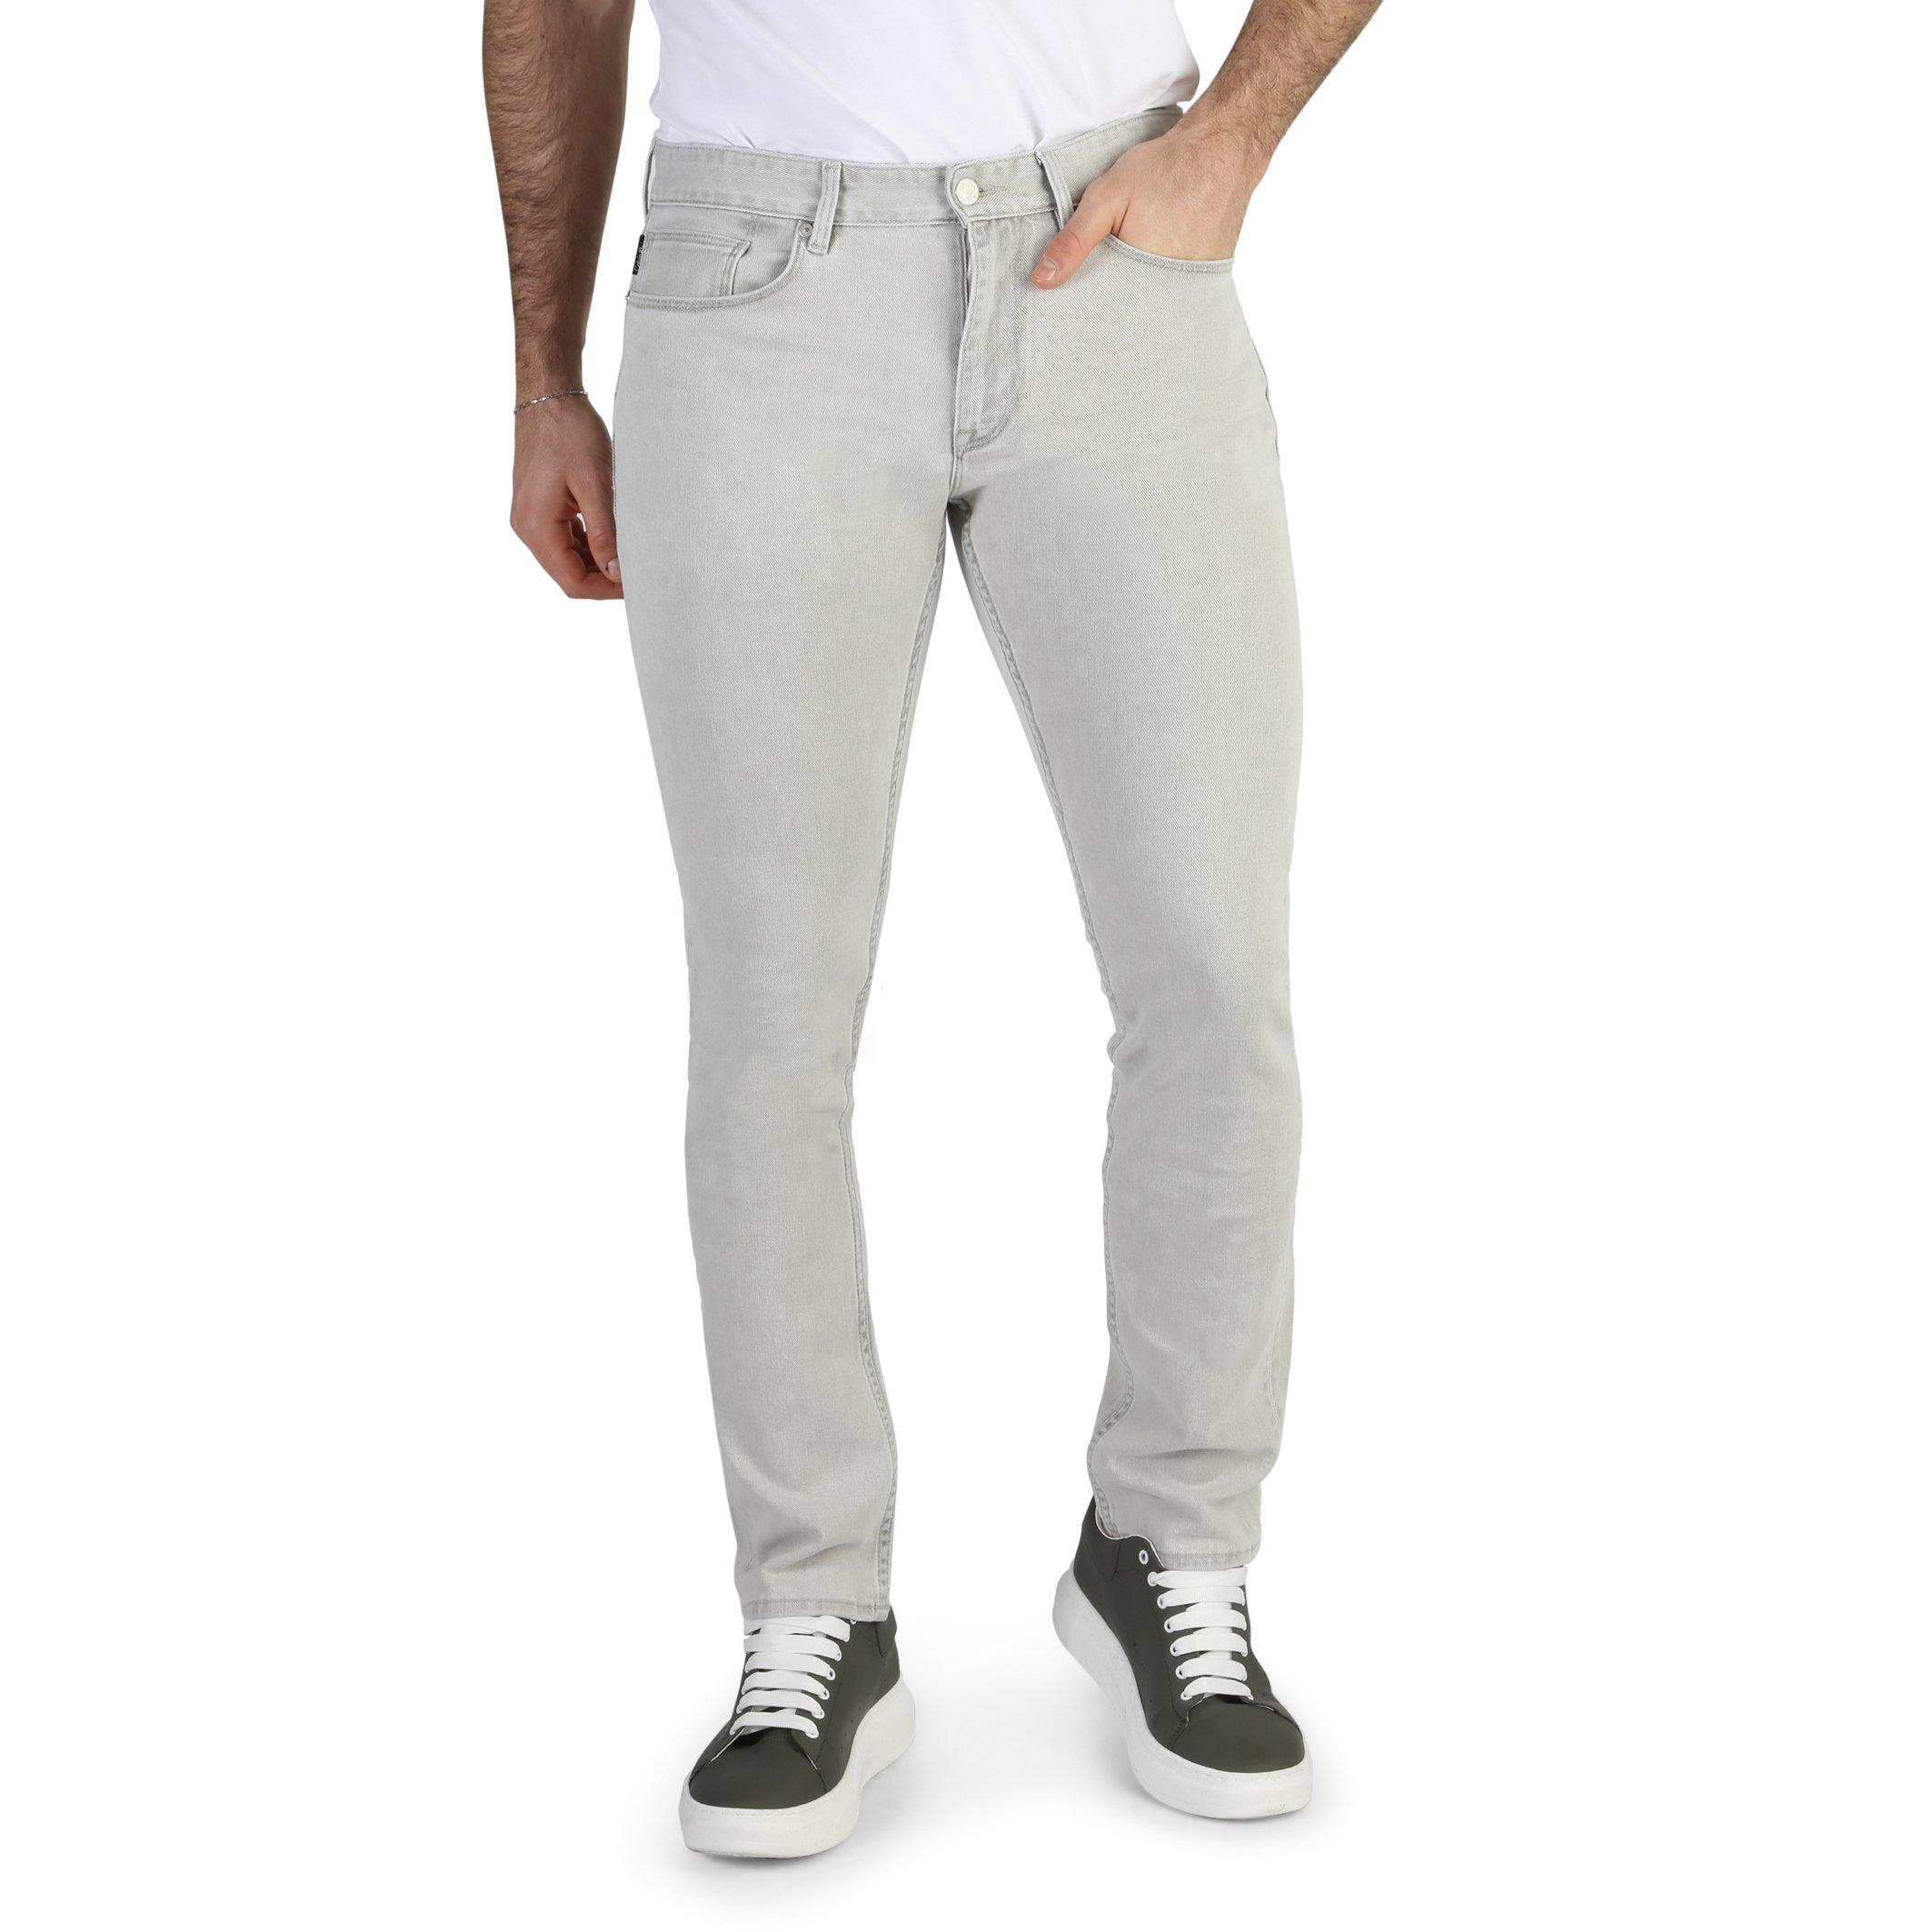 Calvin Klein Men's Jeans Grey K10K101005 - grey-1 33